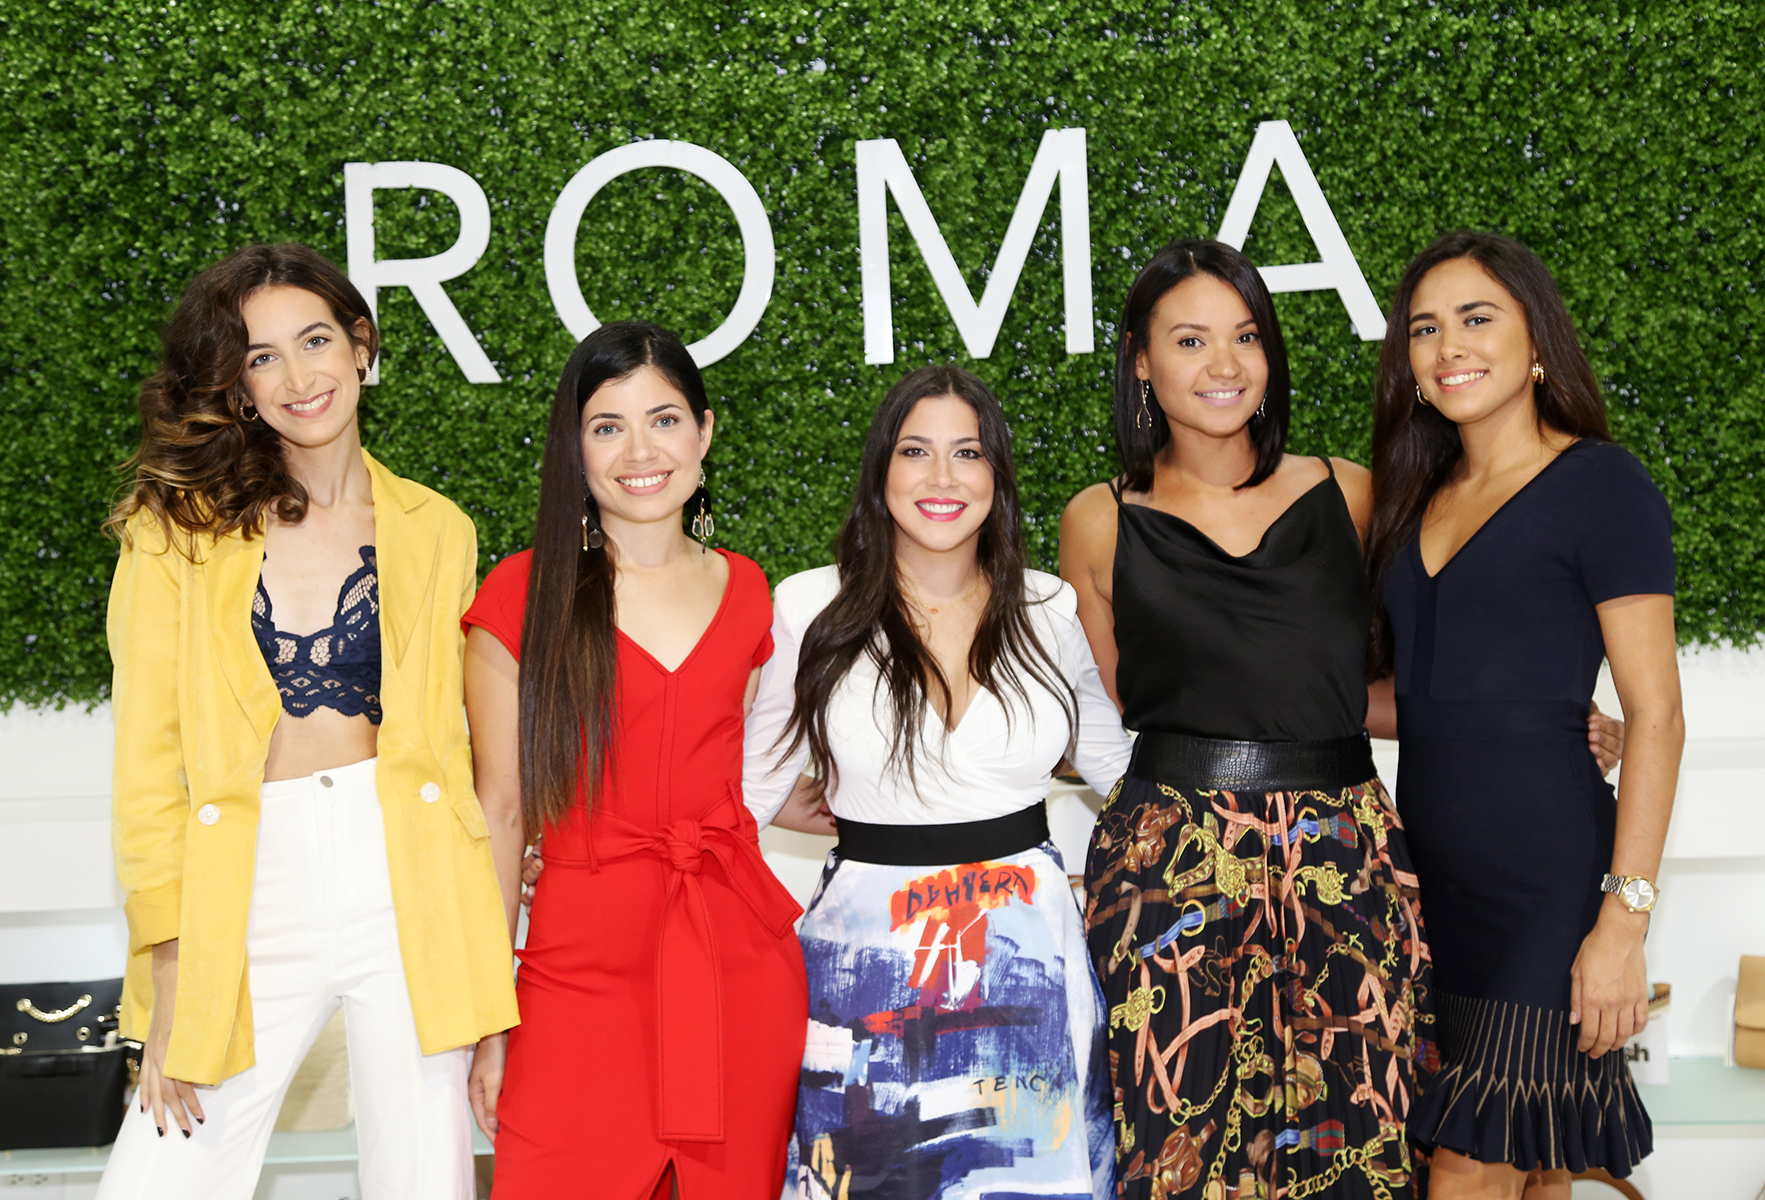 Rachel López, Karina García, Lourimer Rodríguez, Yadiza Ramos, Danaliz De Jesús. (Nichole Saldarriaga)